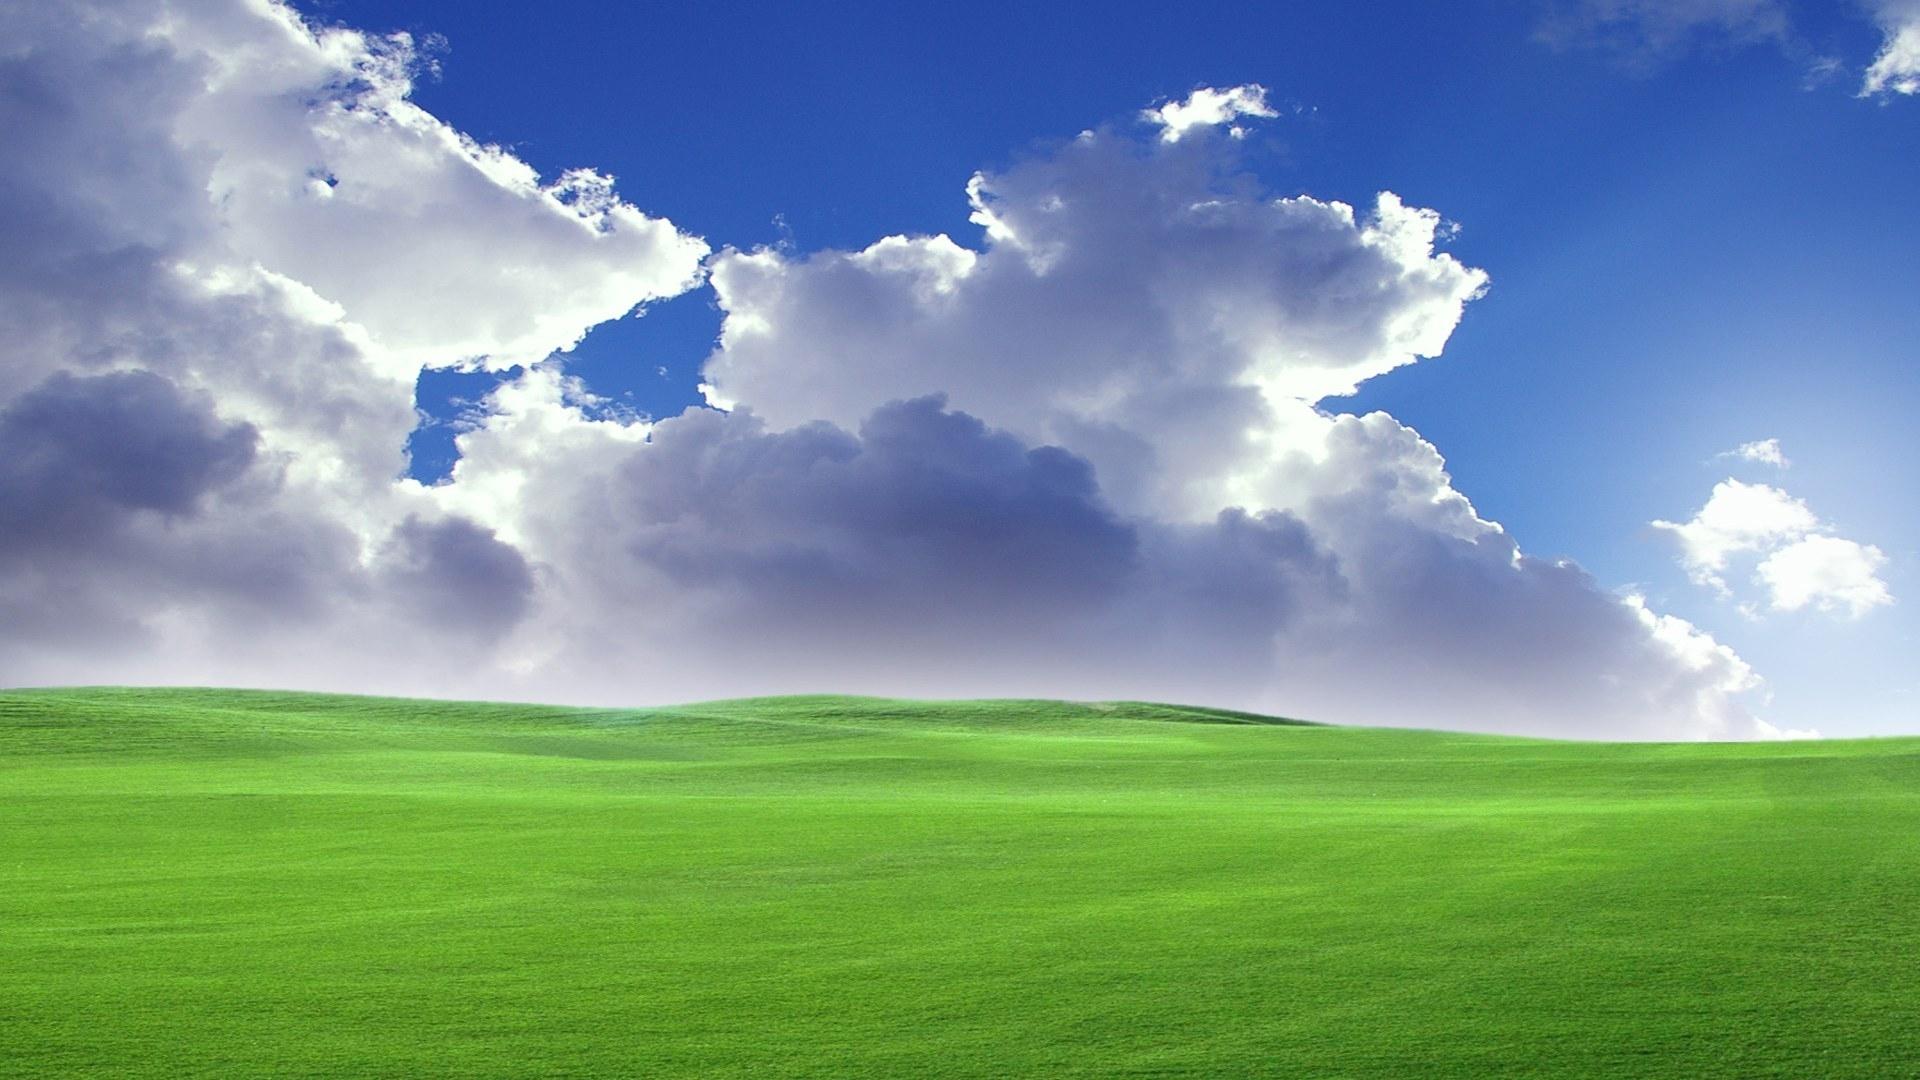 Hd Wallpaper Widescreen 1080p Nature Windows Xp Wallpaper Hd